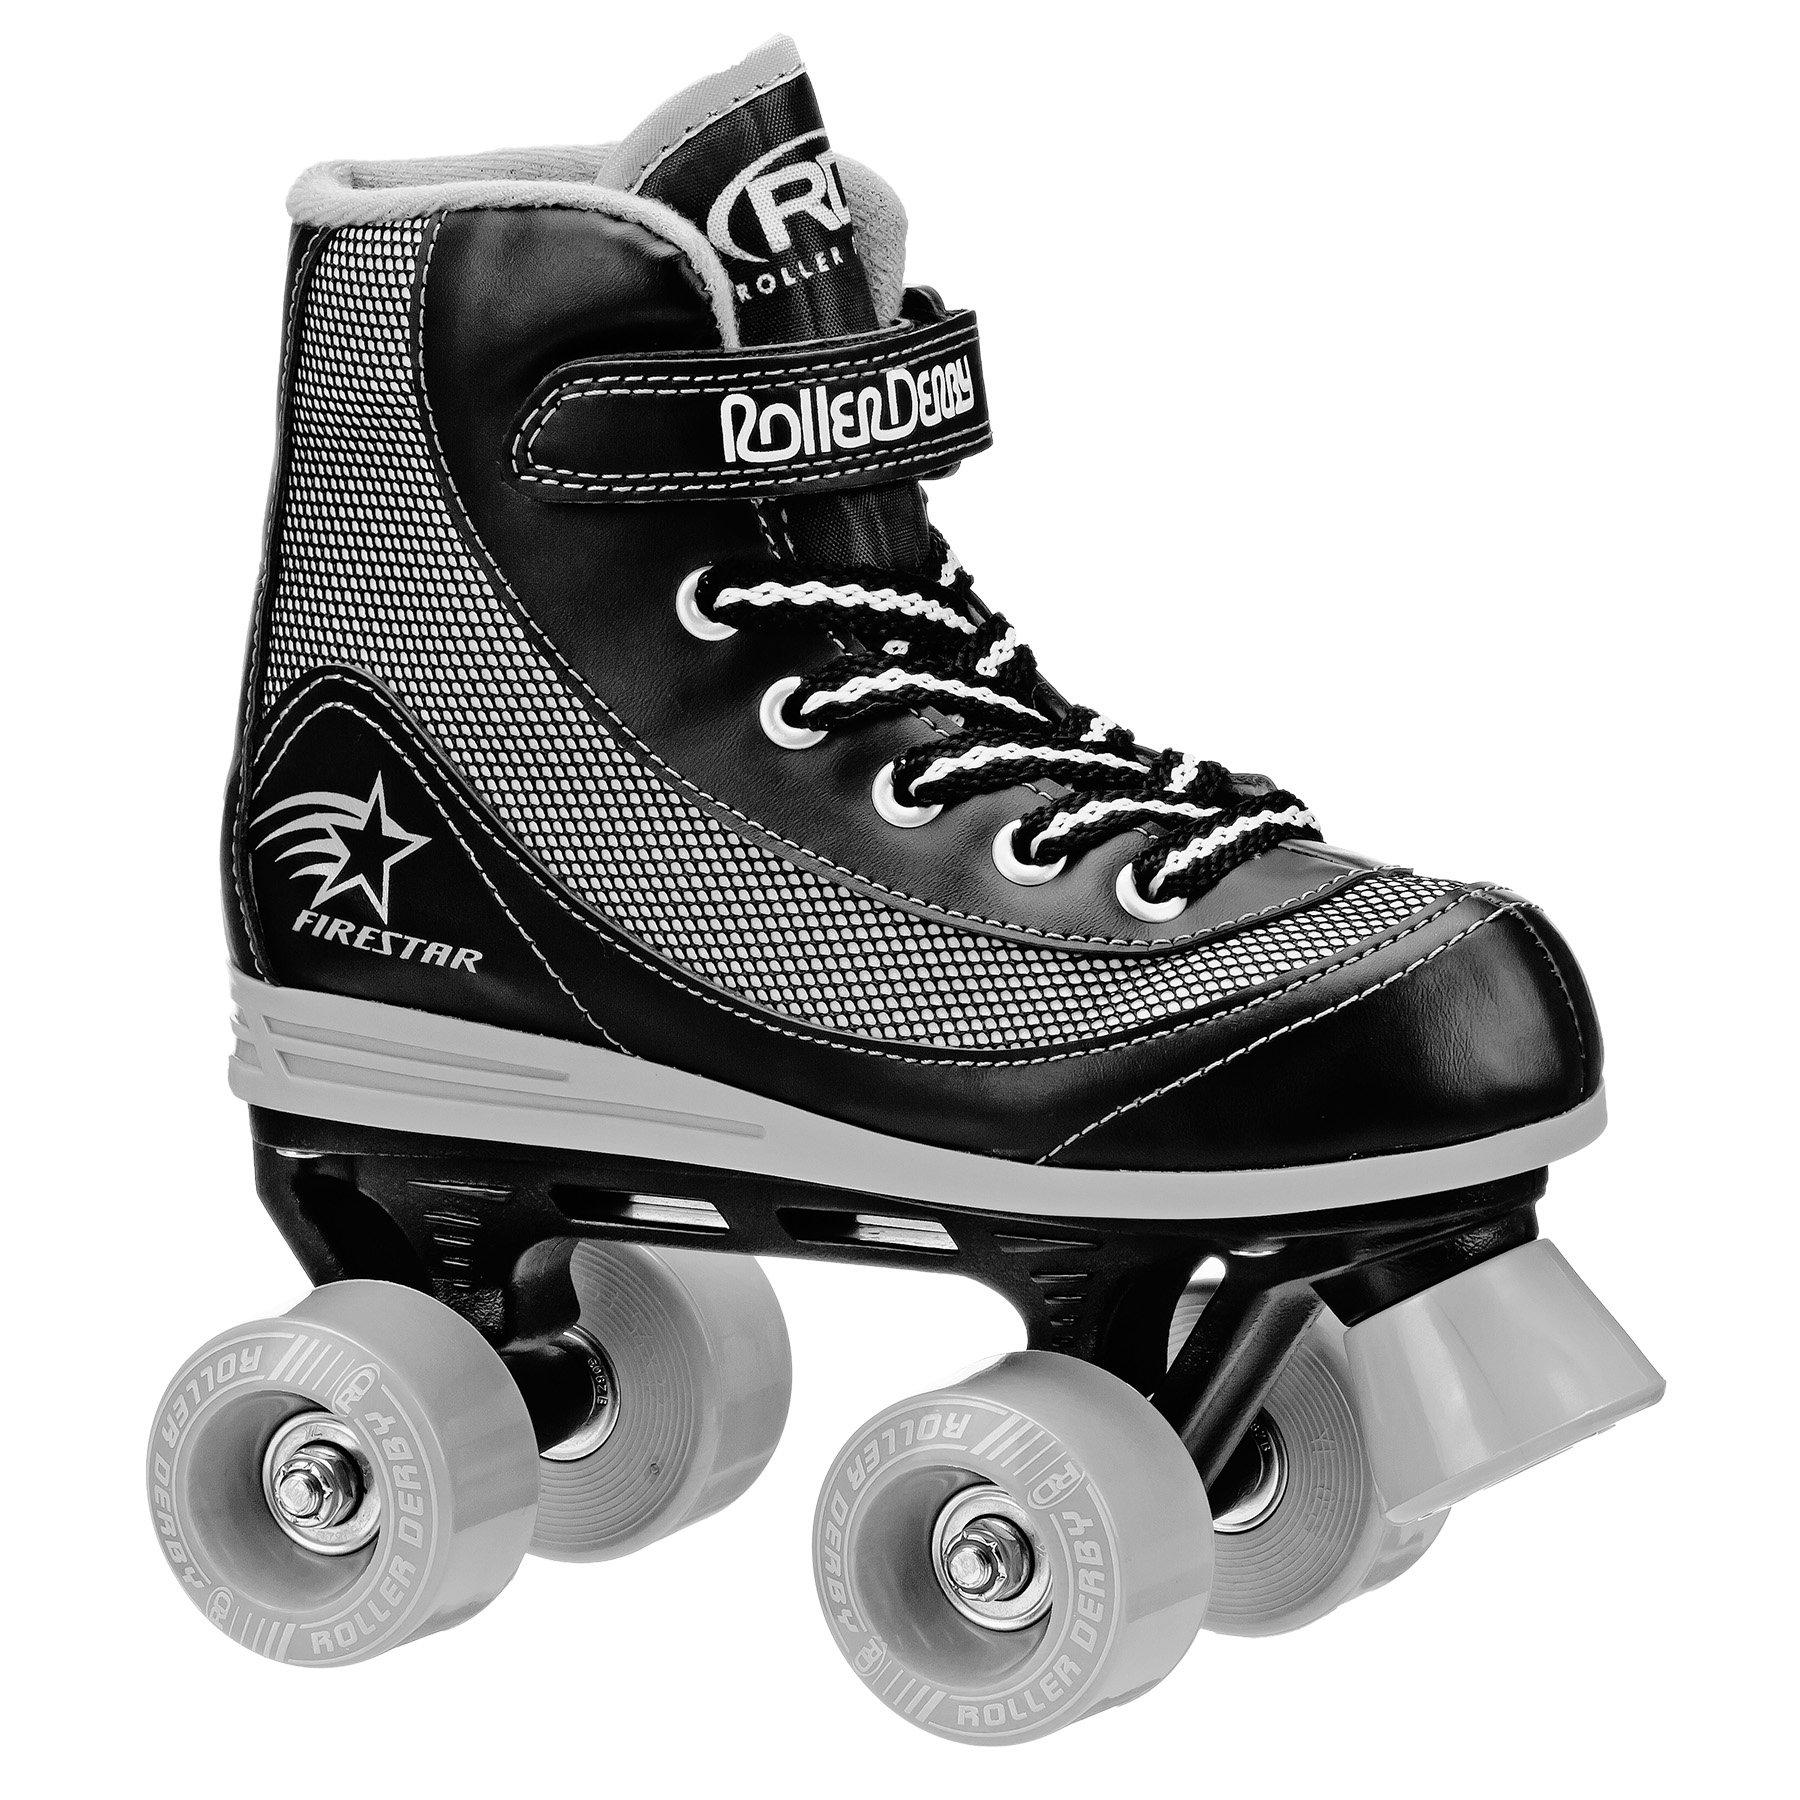 Roller Derby 1378-04 Youth Boys Firestar Roller Skate, Size 4, Black/Gray by Roller Derby